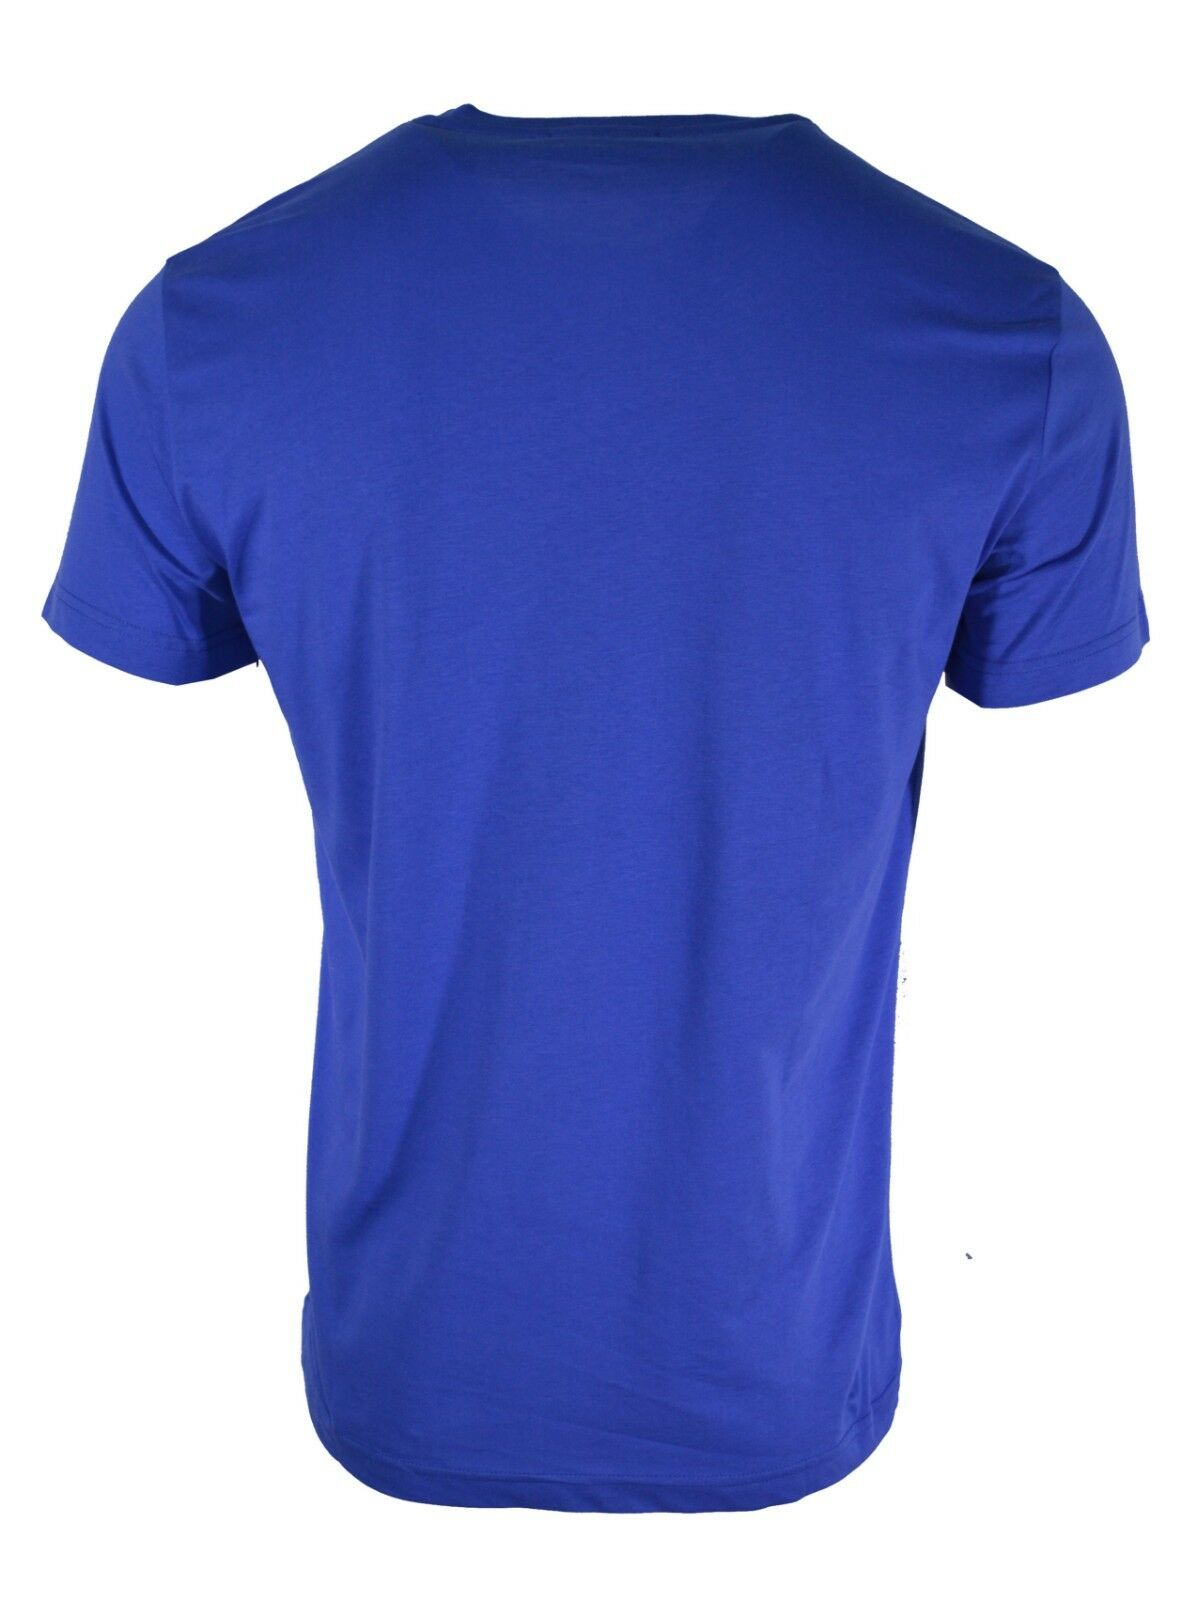 BNWT Versace Versace Versace Jeans Blu Royal & Nero Foglia ricamato sul petto Tiger T-Shirt Logo 6c1338